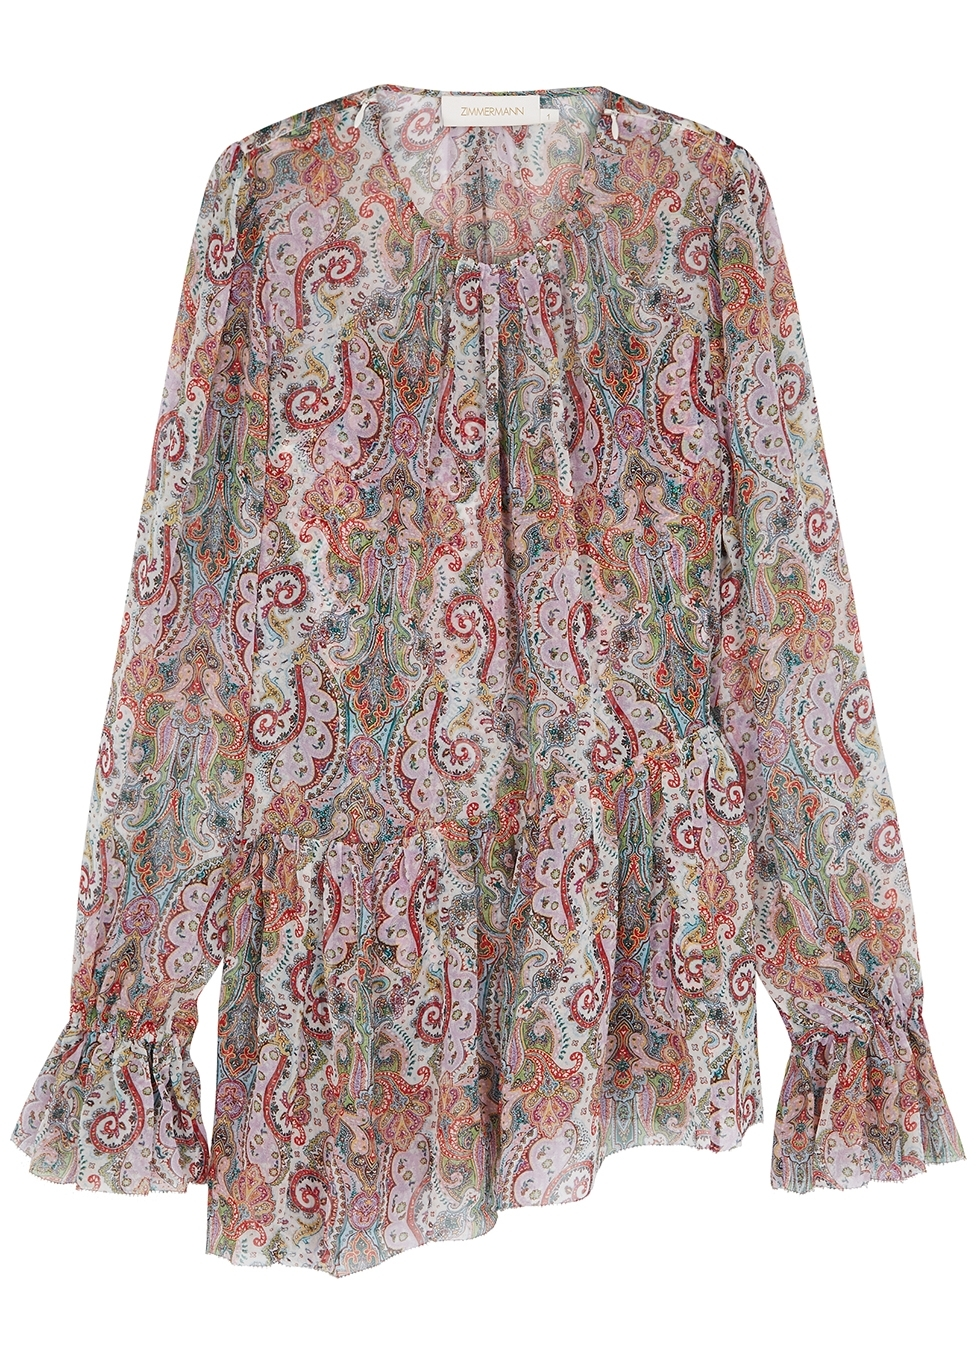 3ad7a1c2935cf Women s Designer Blouses - Silk